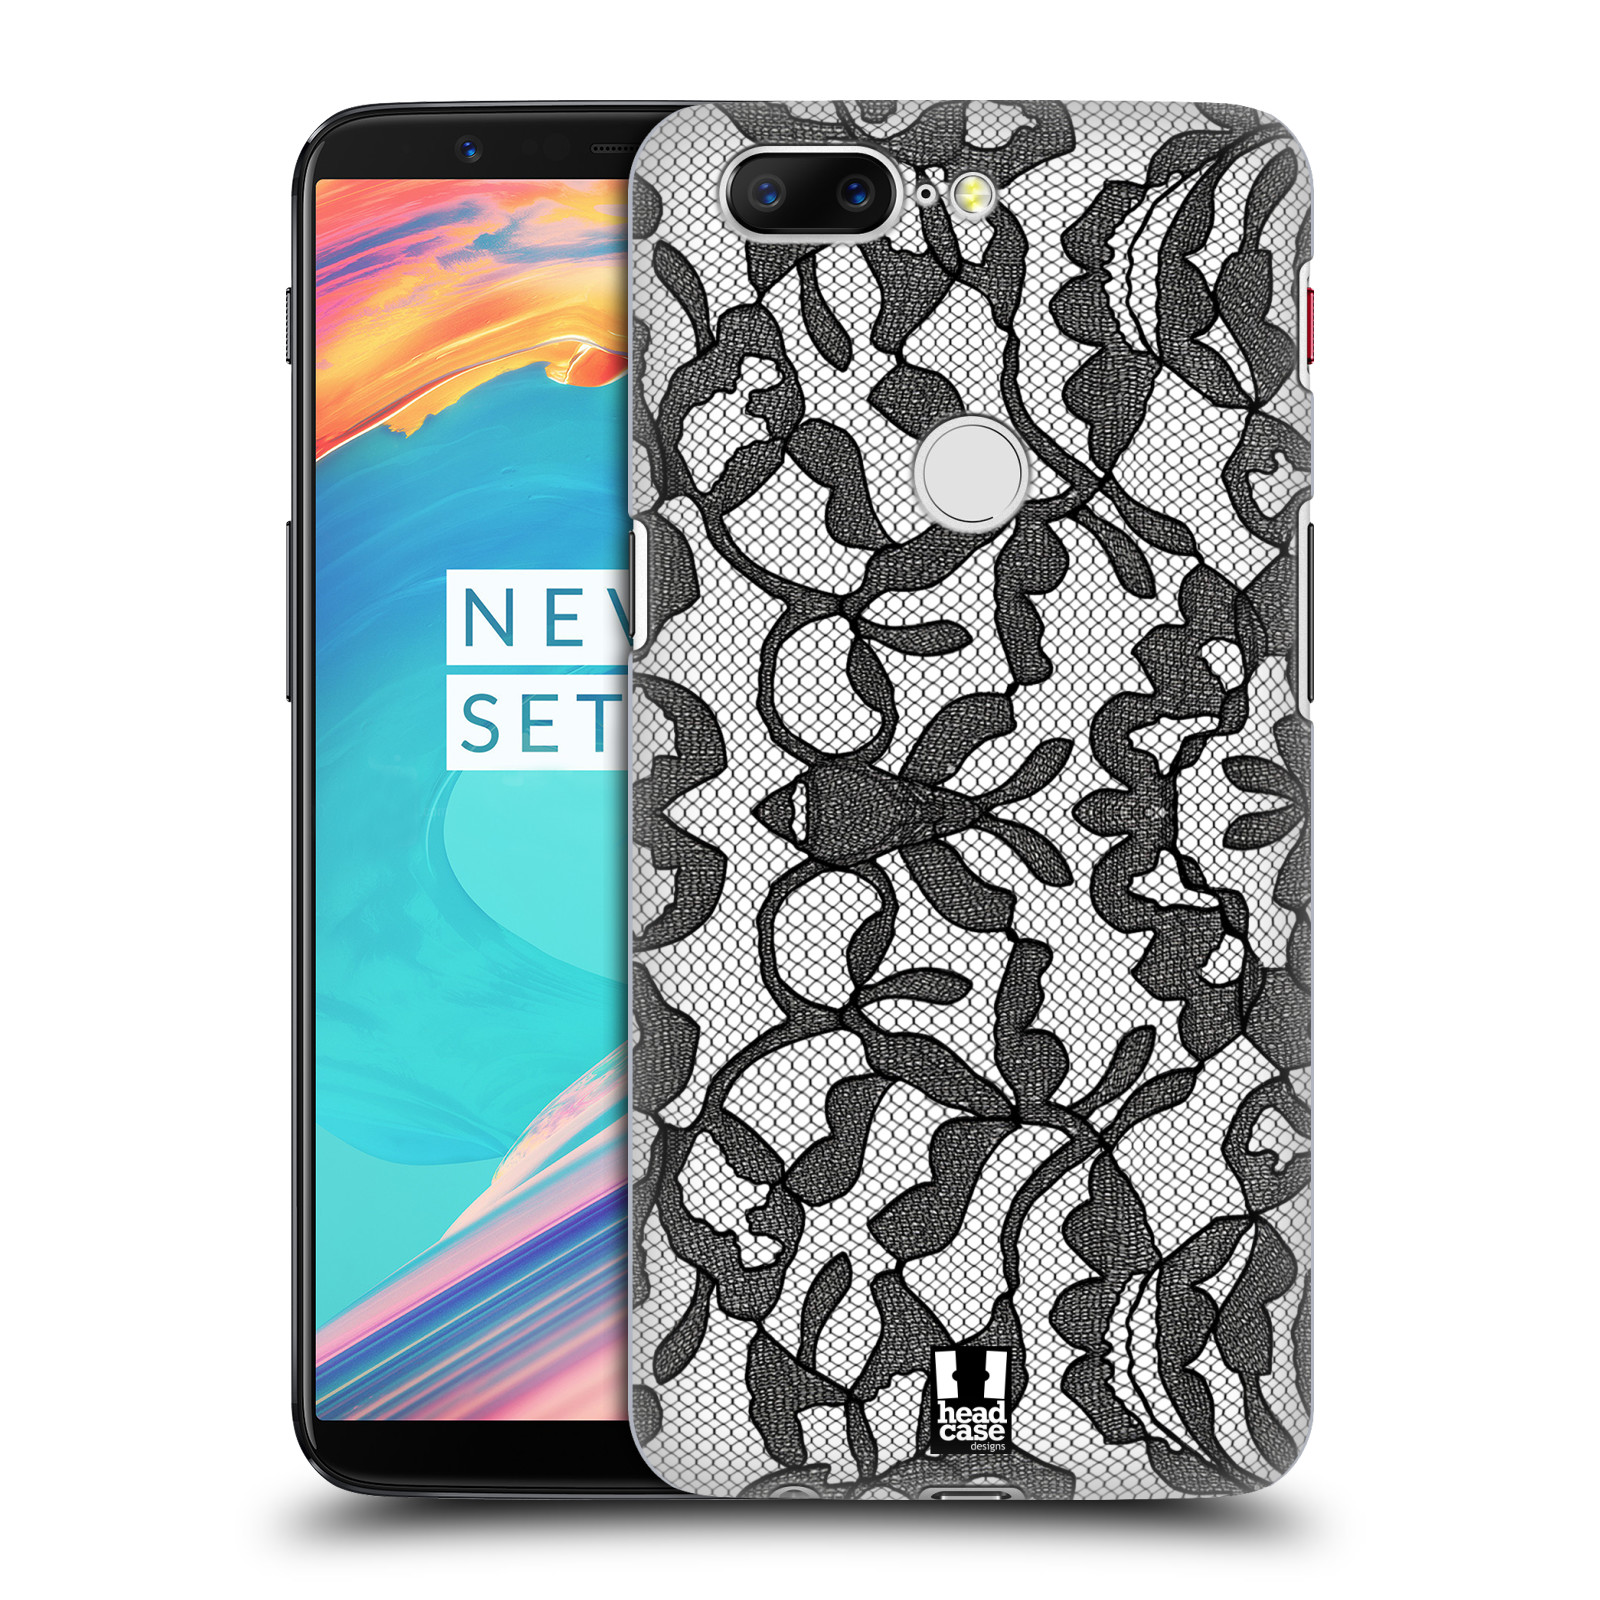 Plastové pouzdro na mobil OnePlus 5T - Head Case - LEAFY KRAJKA